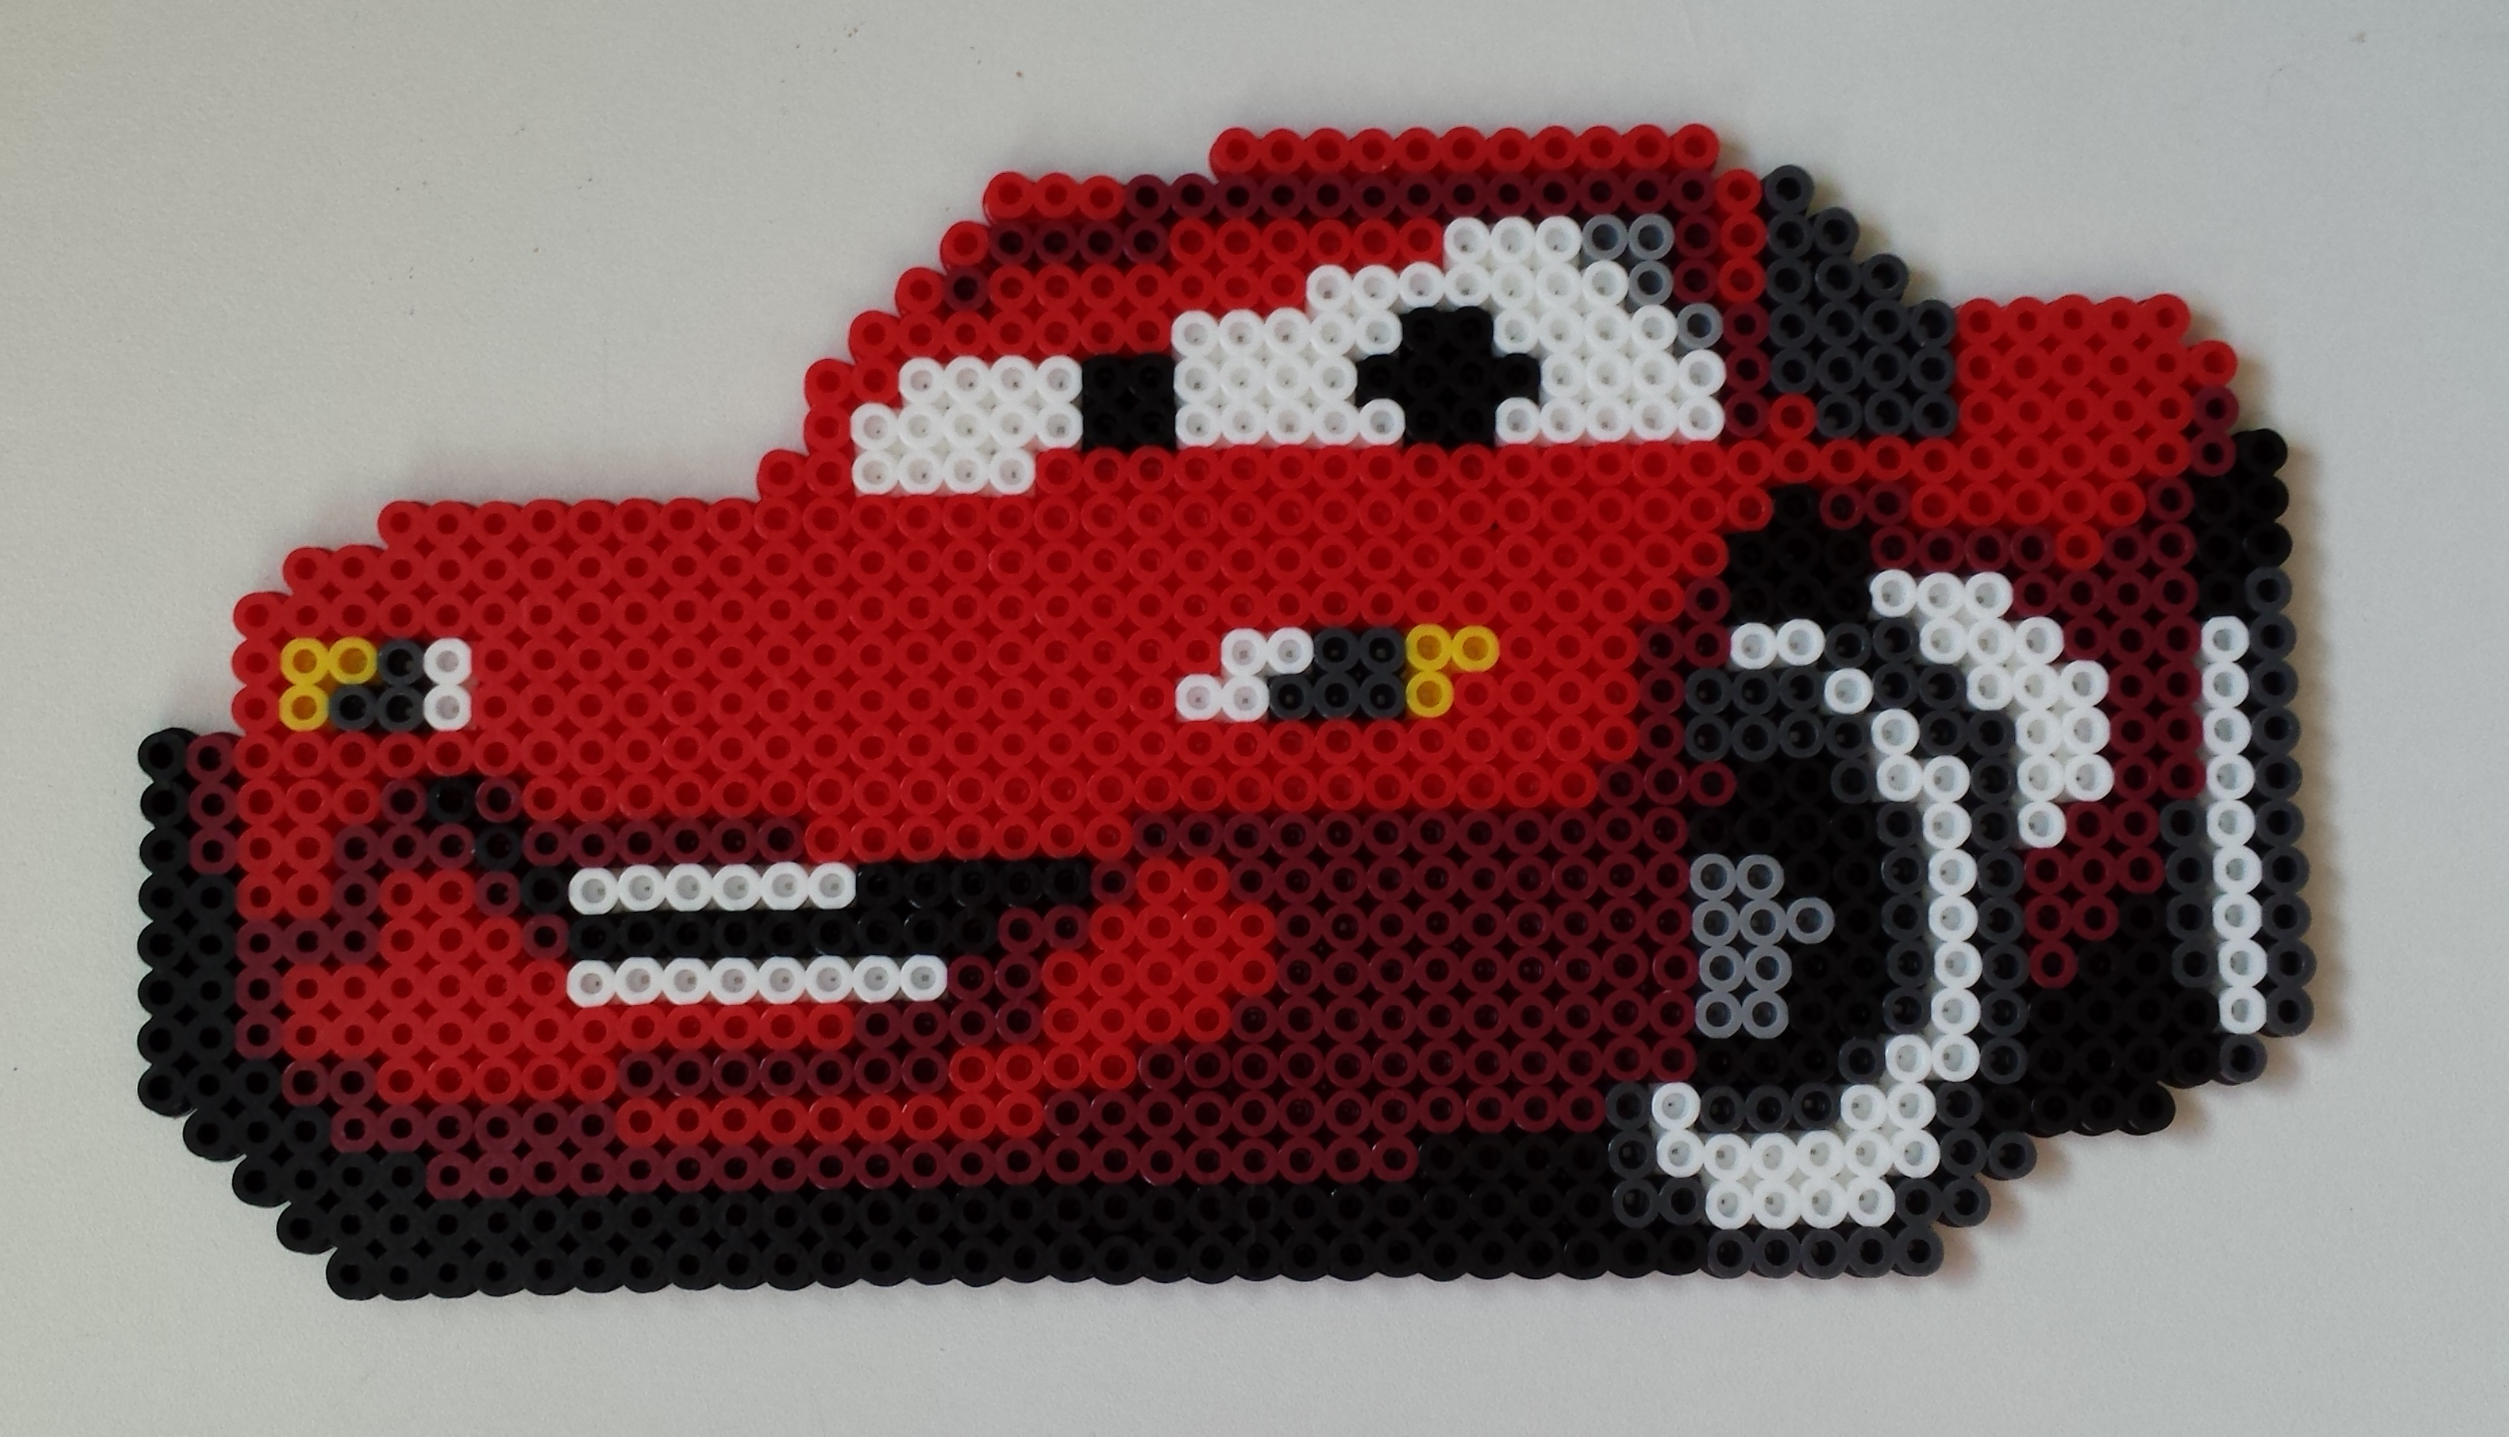 Lightning Mcqueen From Cars Done In Perler Beads Bugelperlen Bugelperlen Vorlagen Basteln